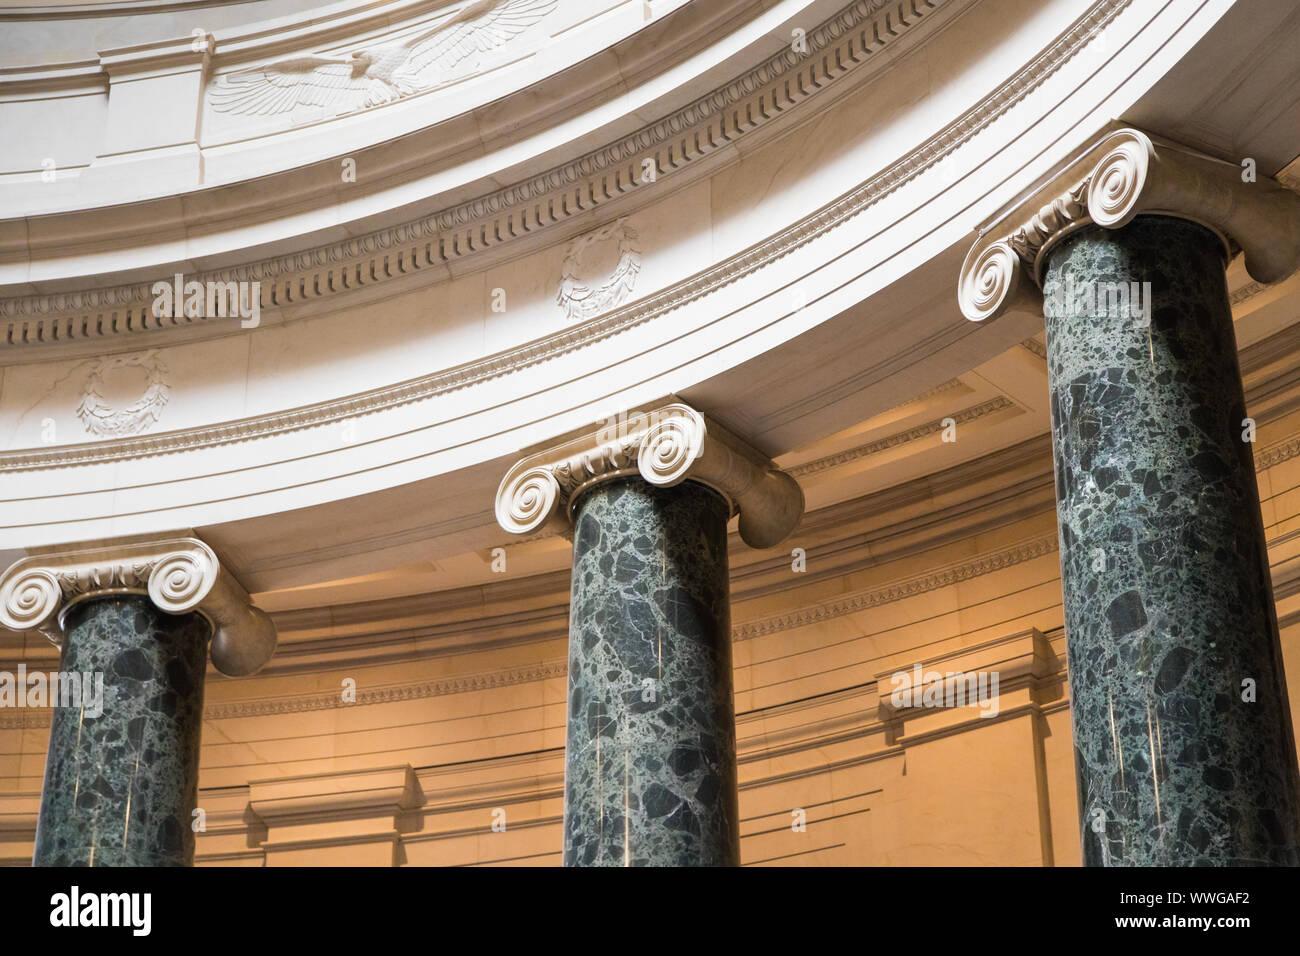 Washington DC, USA - June 6th 2019: Columns inside National Gallery of Art Stock Photo